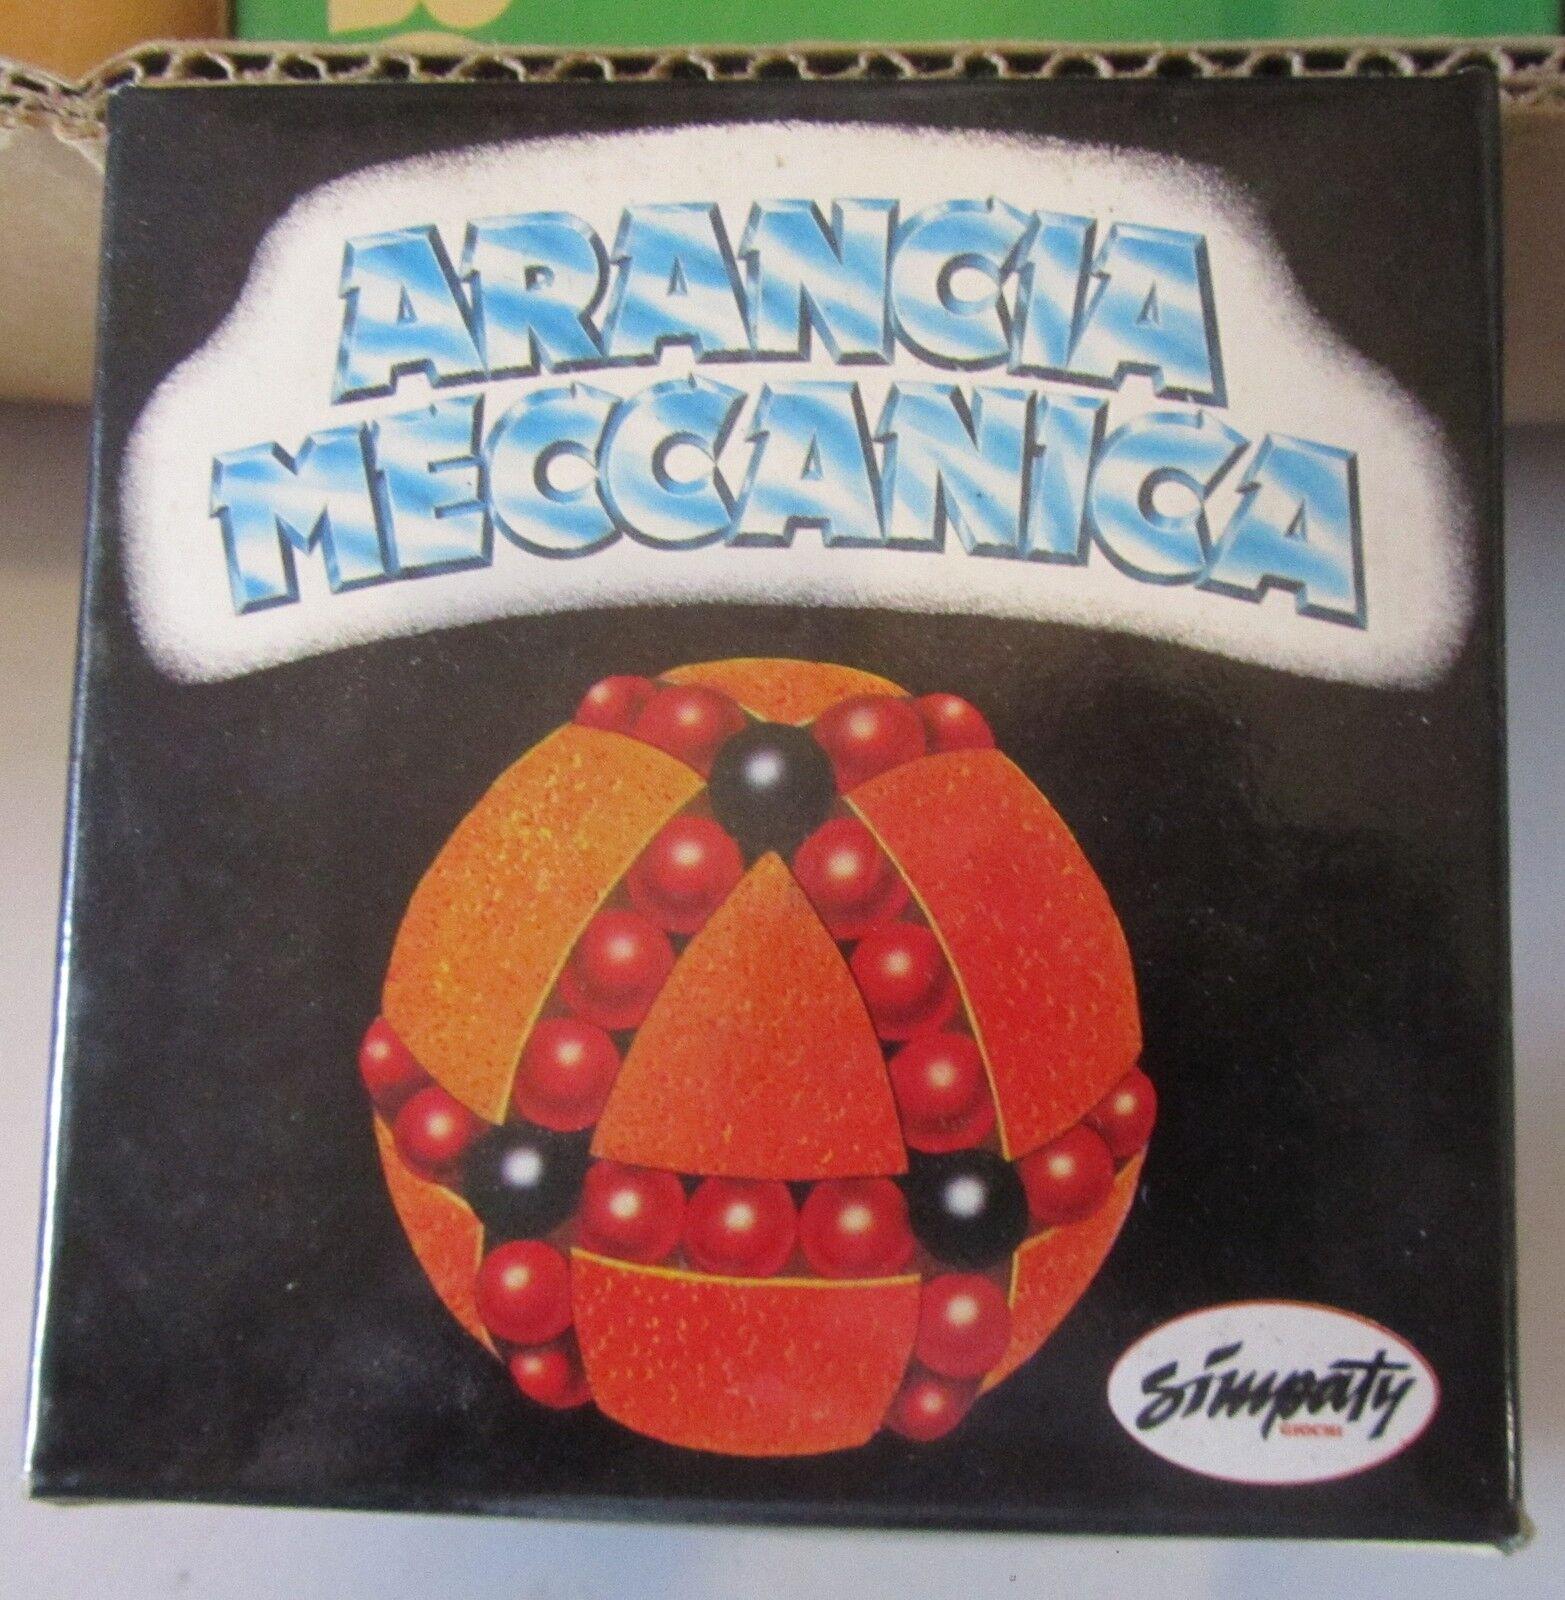 Rompecabezas  rompicapo naranja Meccanica simpaty, 1985.